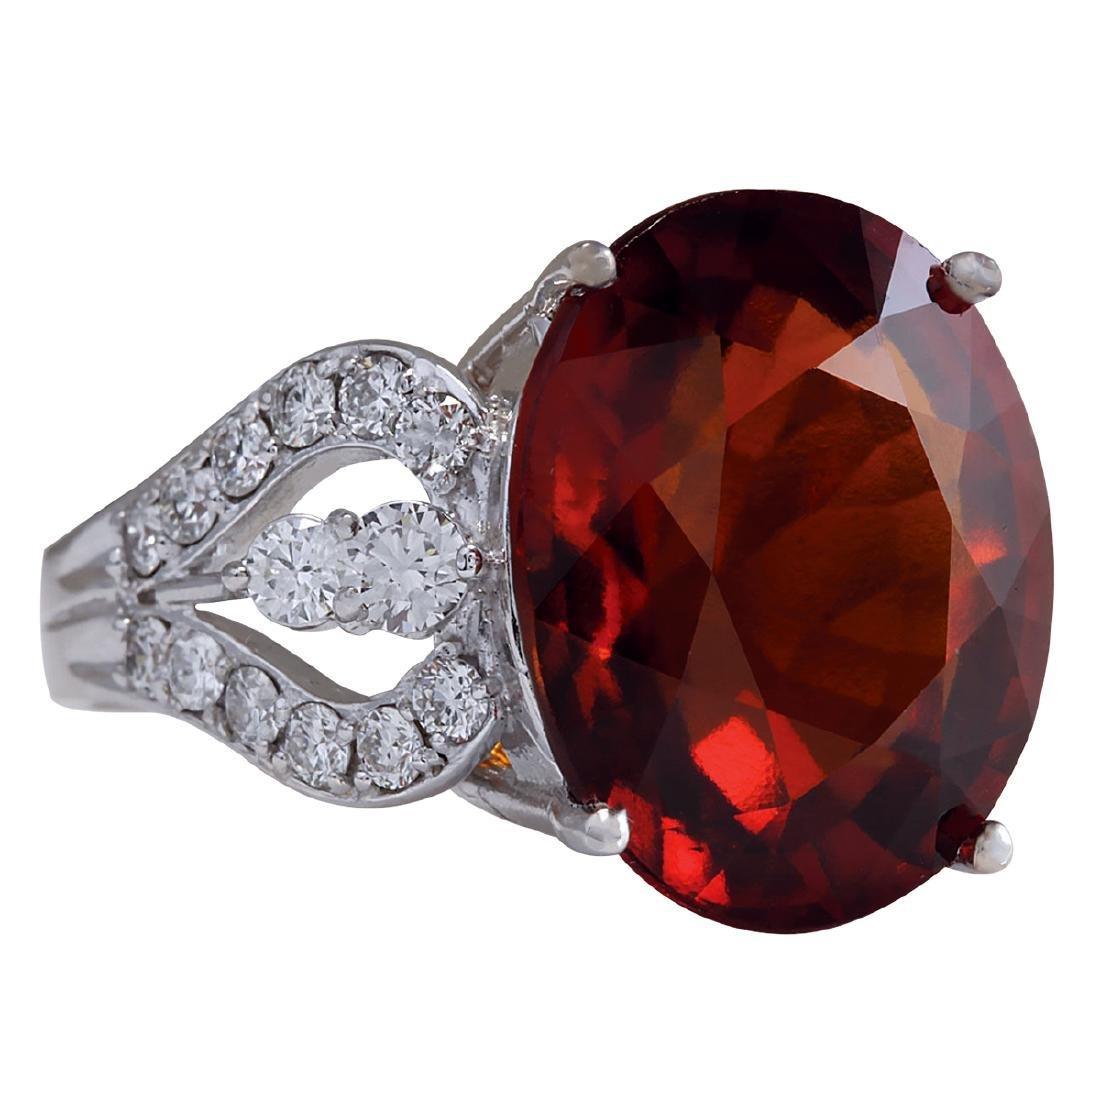 19.81Ct Natural Red Hessonite Garnet And Diamond Ring - 2